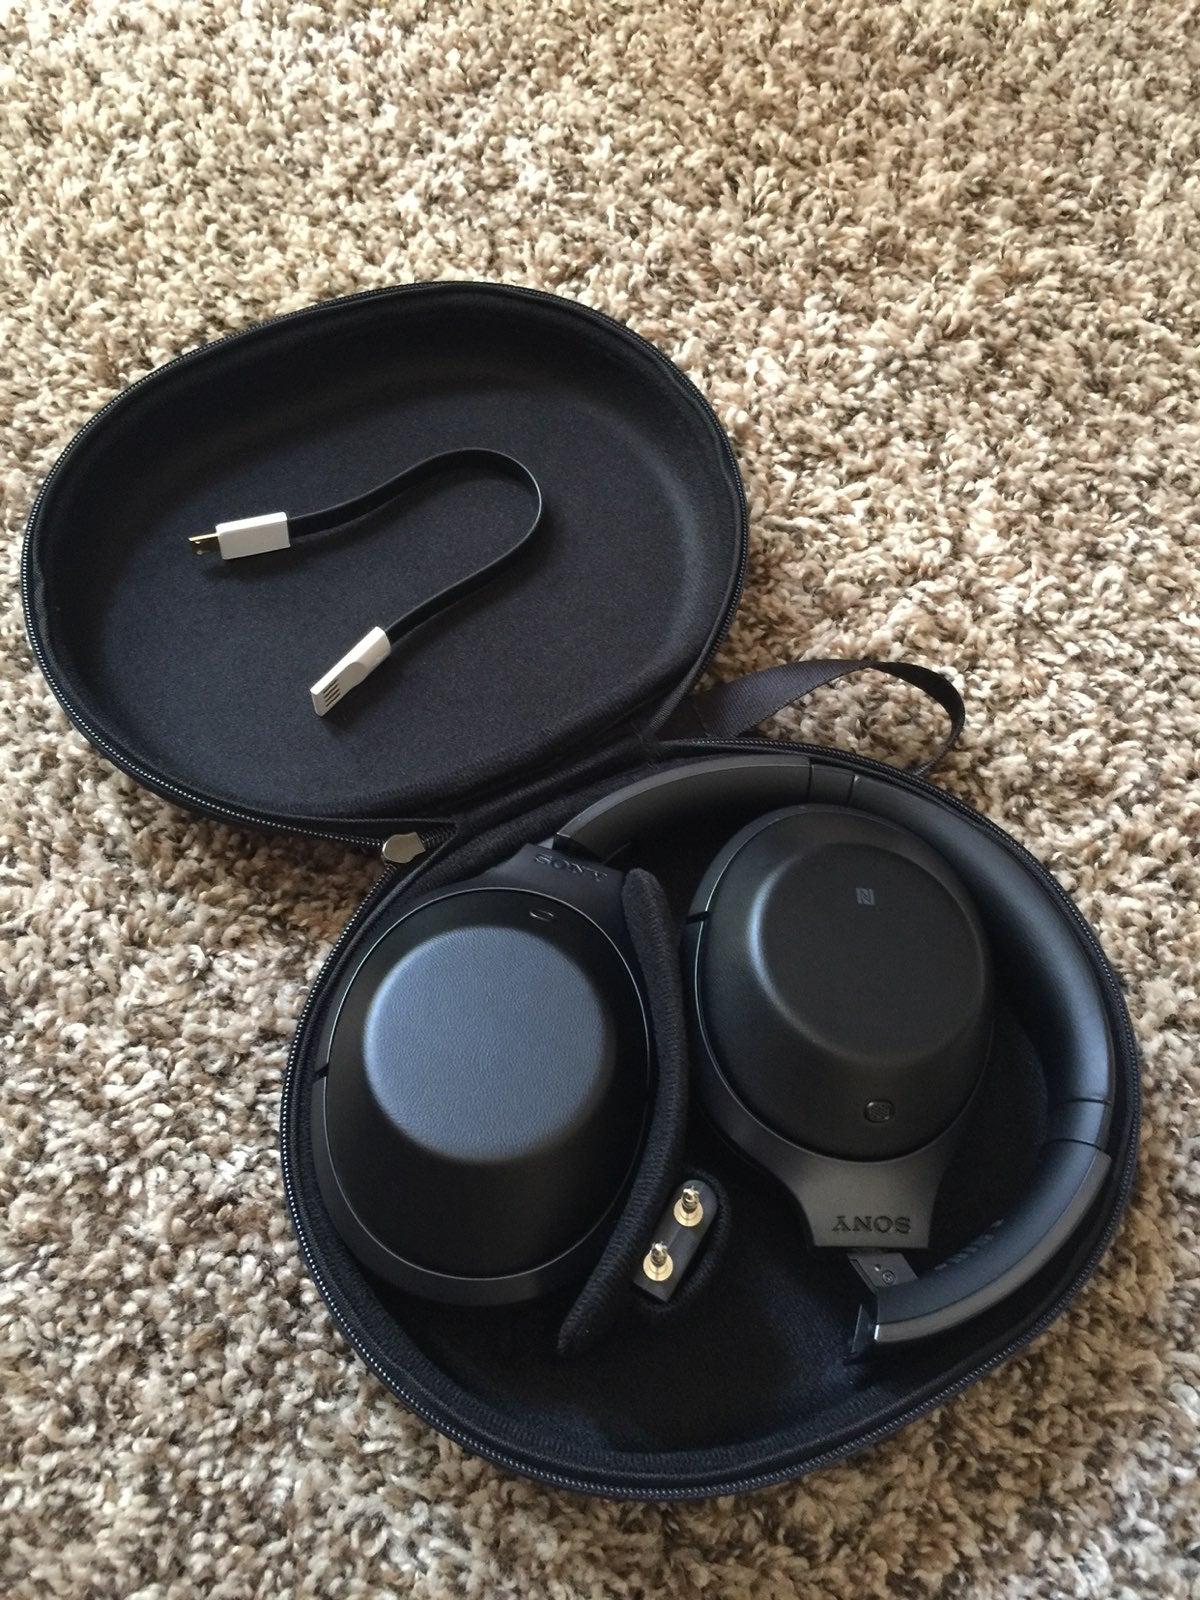 Sony MDR-1000x Bluetooth Headphones